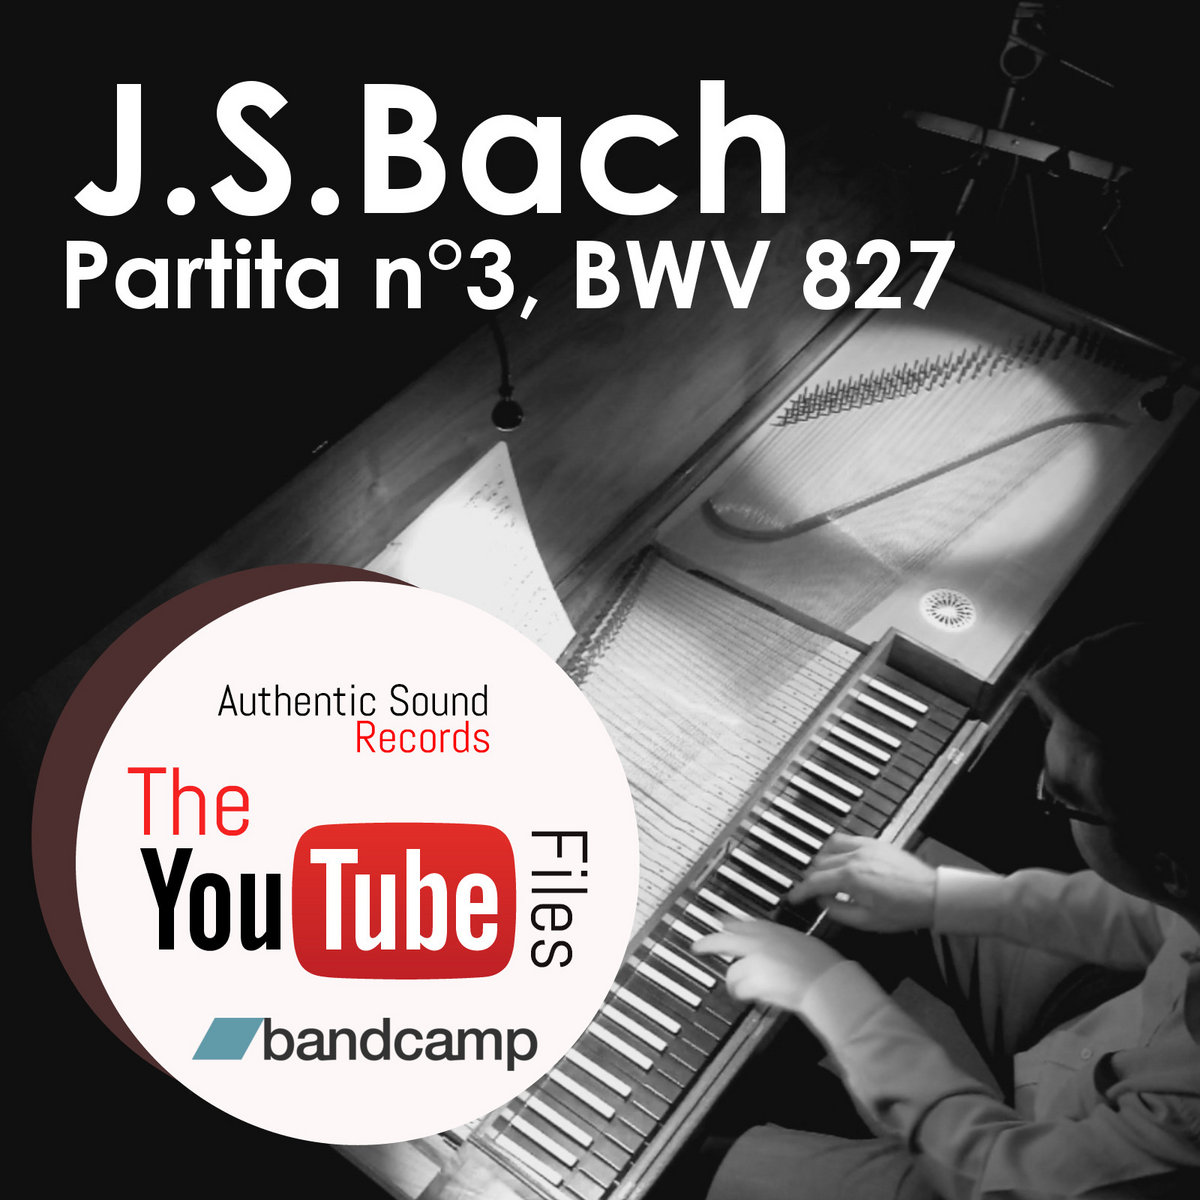 J S Bach, Partita n°3, BWV 827 | Authentic Sound